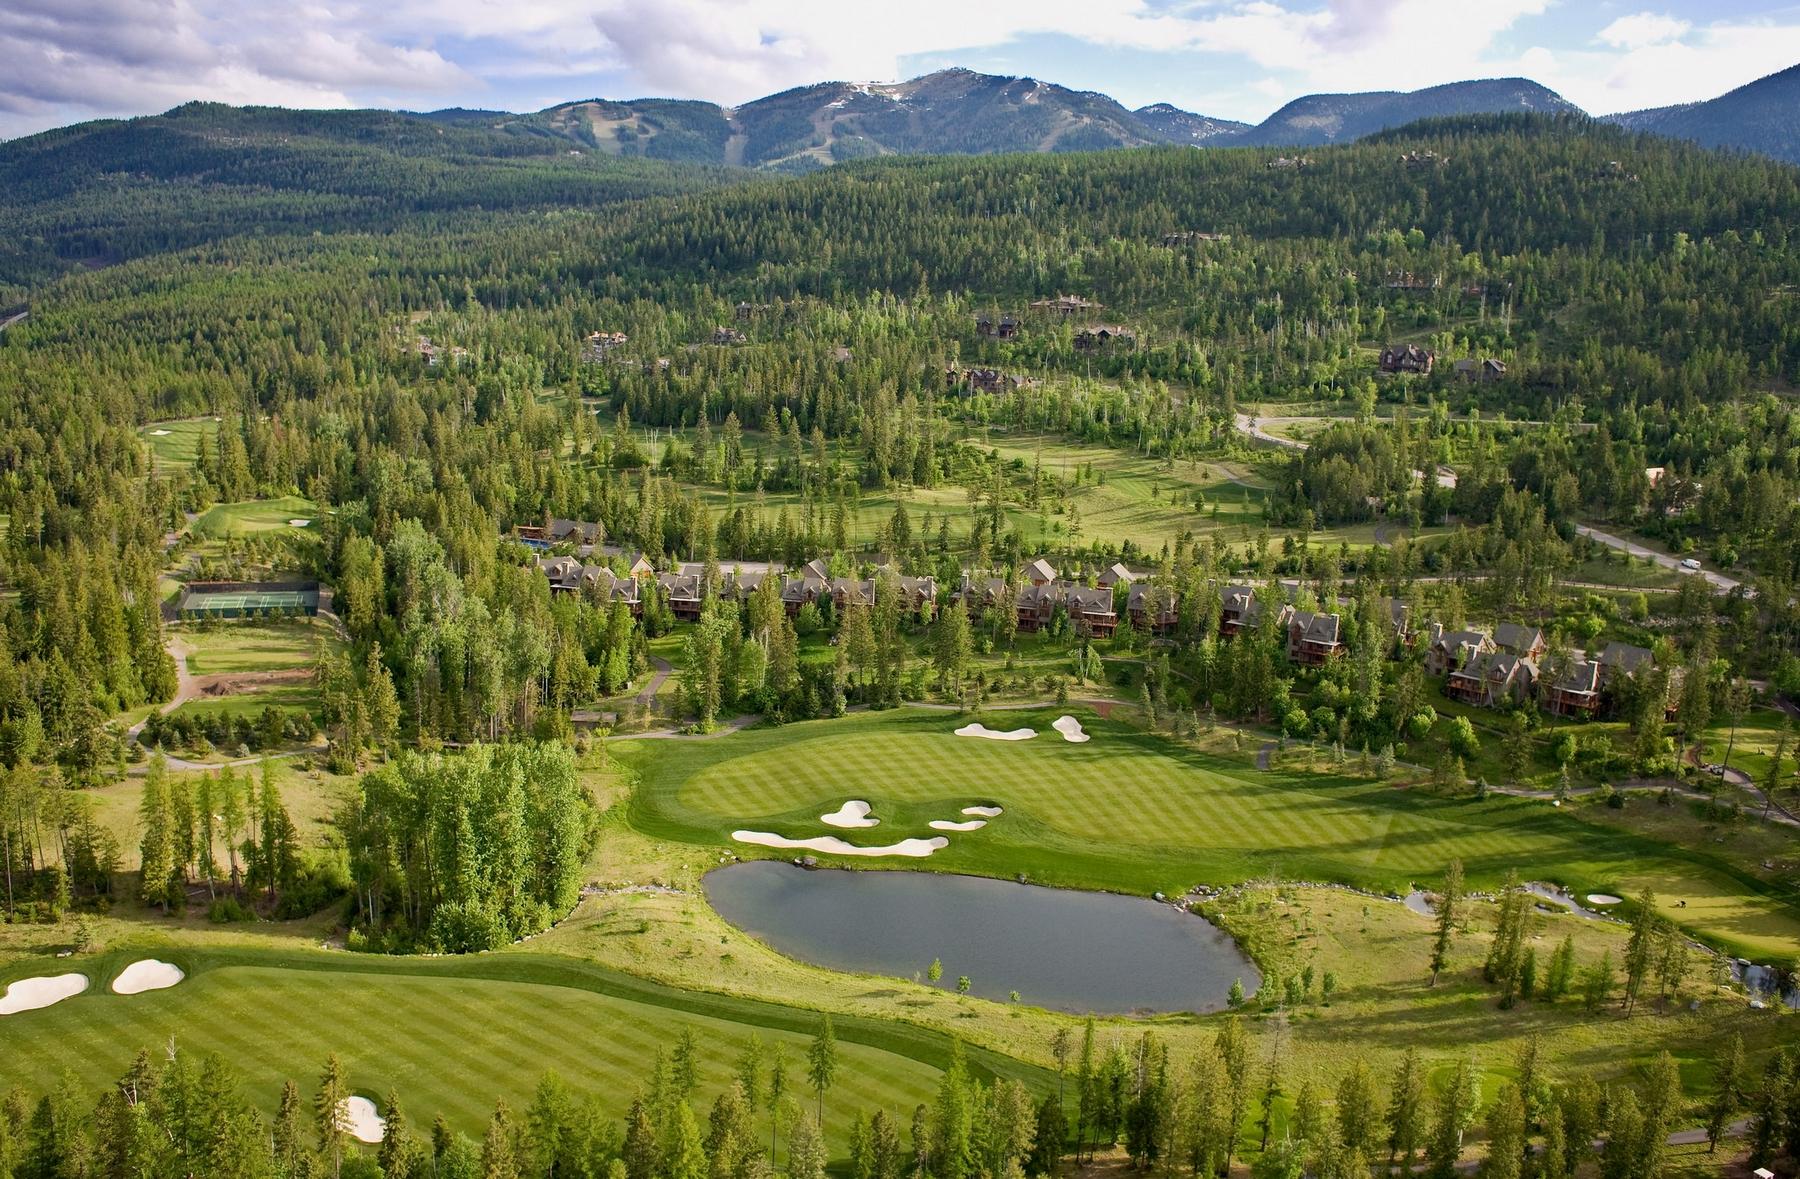 Additional photo for property listing at 153 S Prairiesmoke Cir , Whitefish, MT 59937  Whitefish, Montana 59937 United States